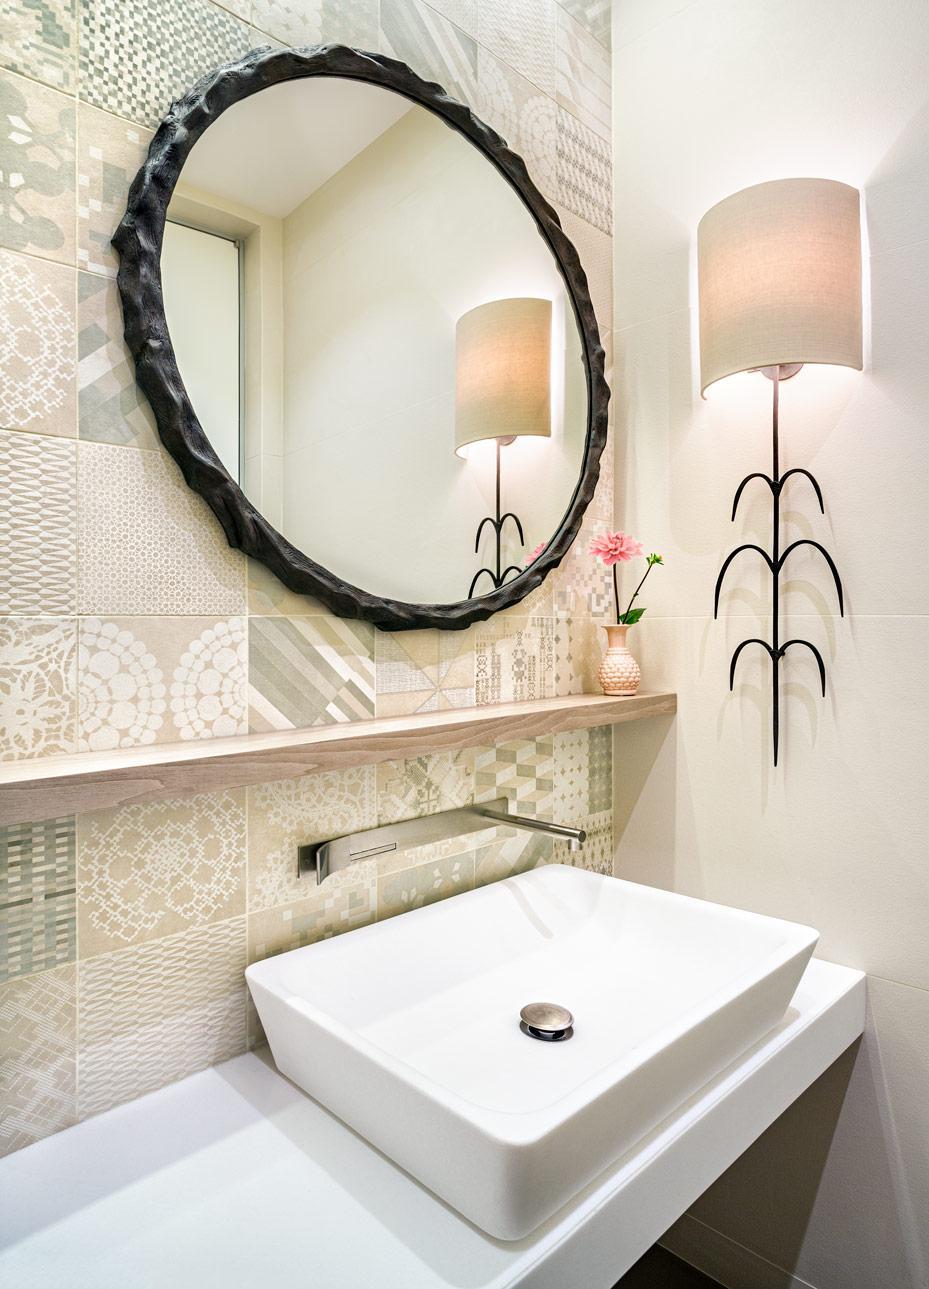 KNOF Design-Beautiful bathroom